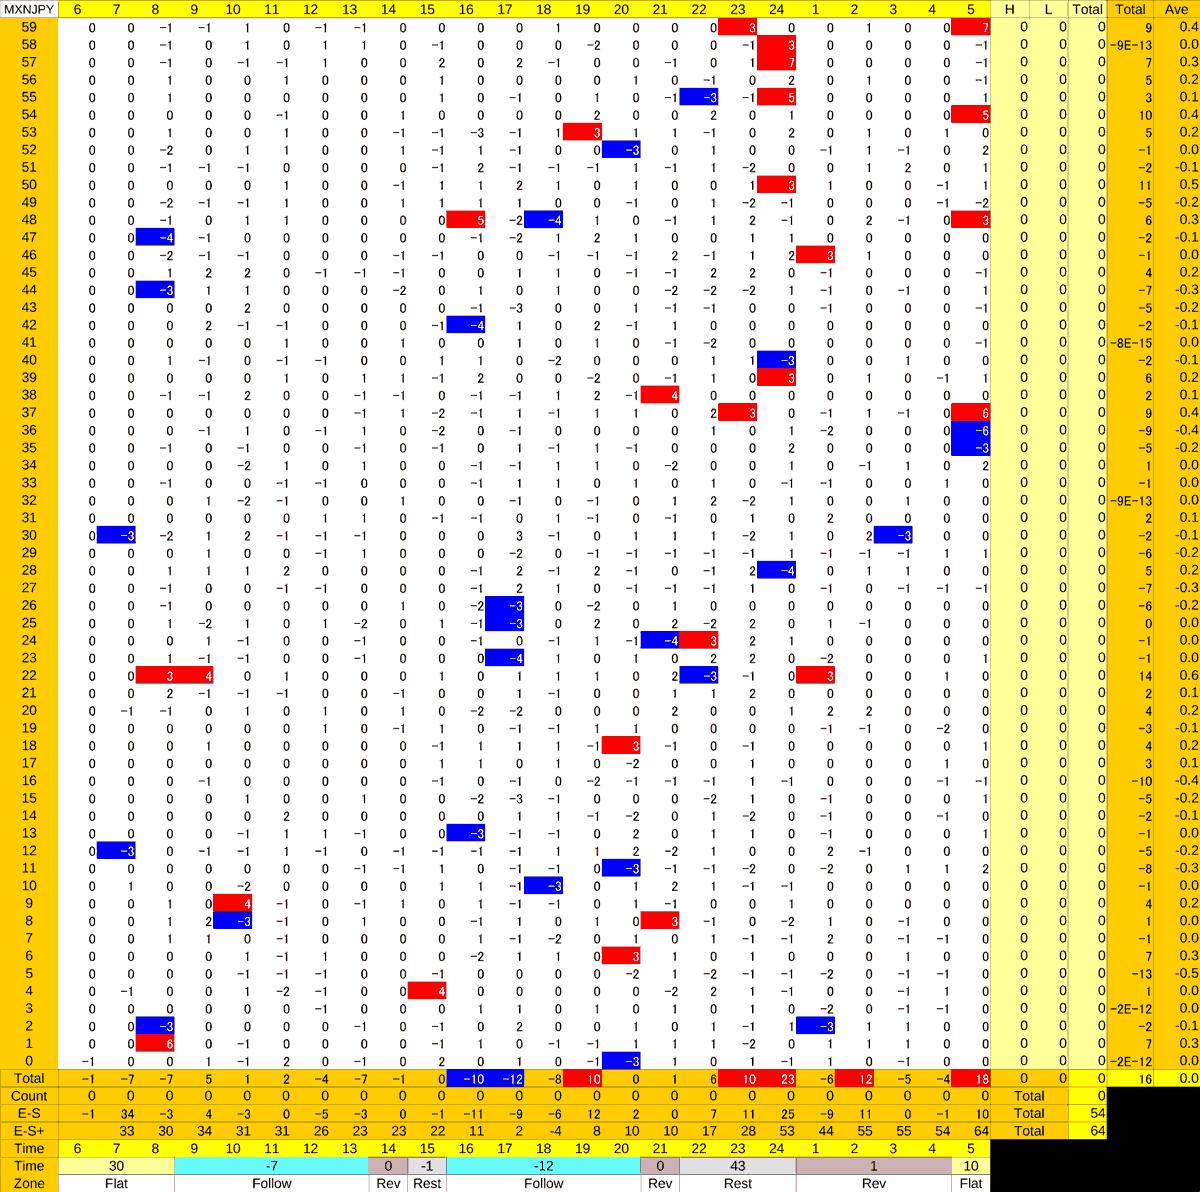 20210118_HS(3)MXNJPY